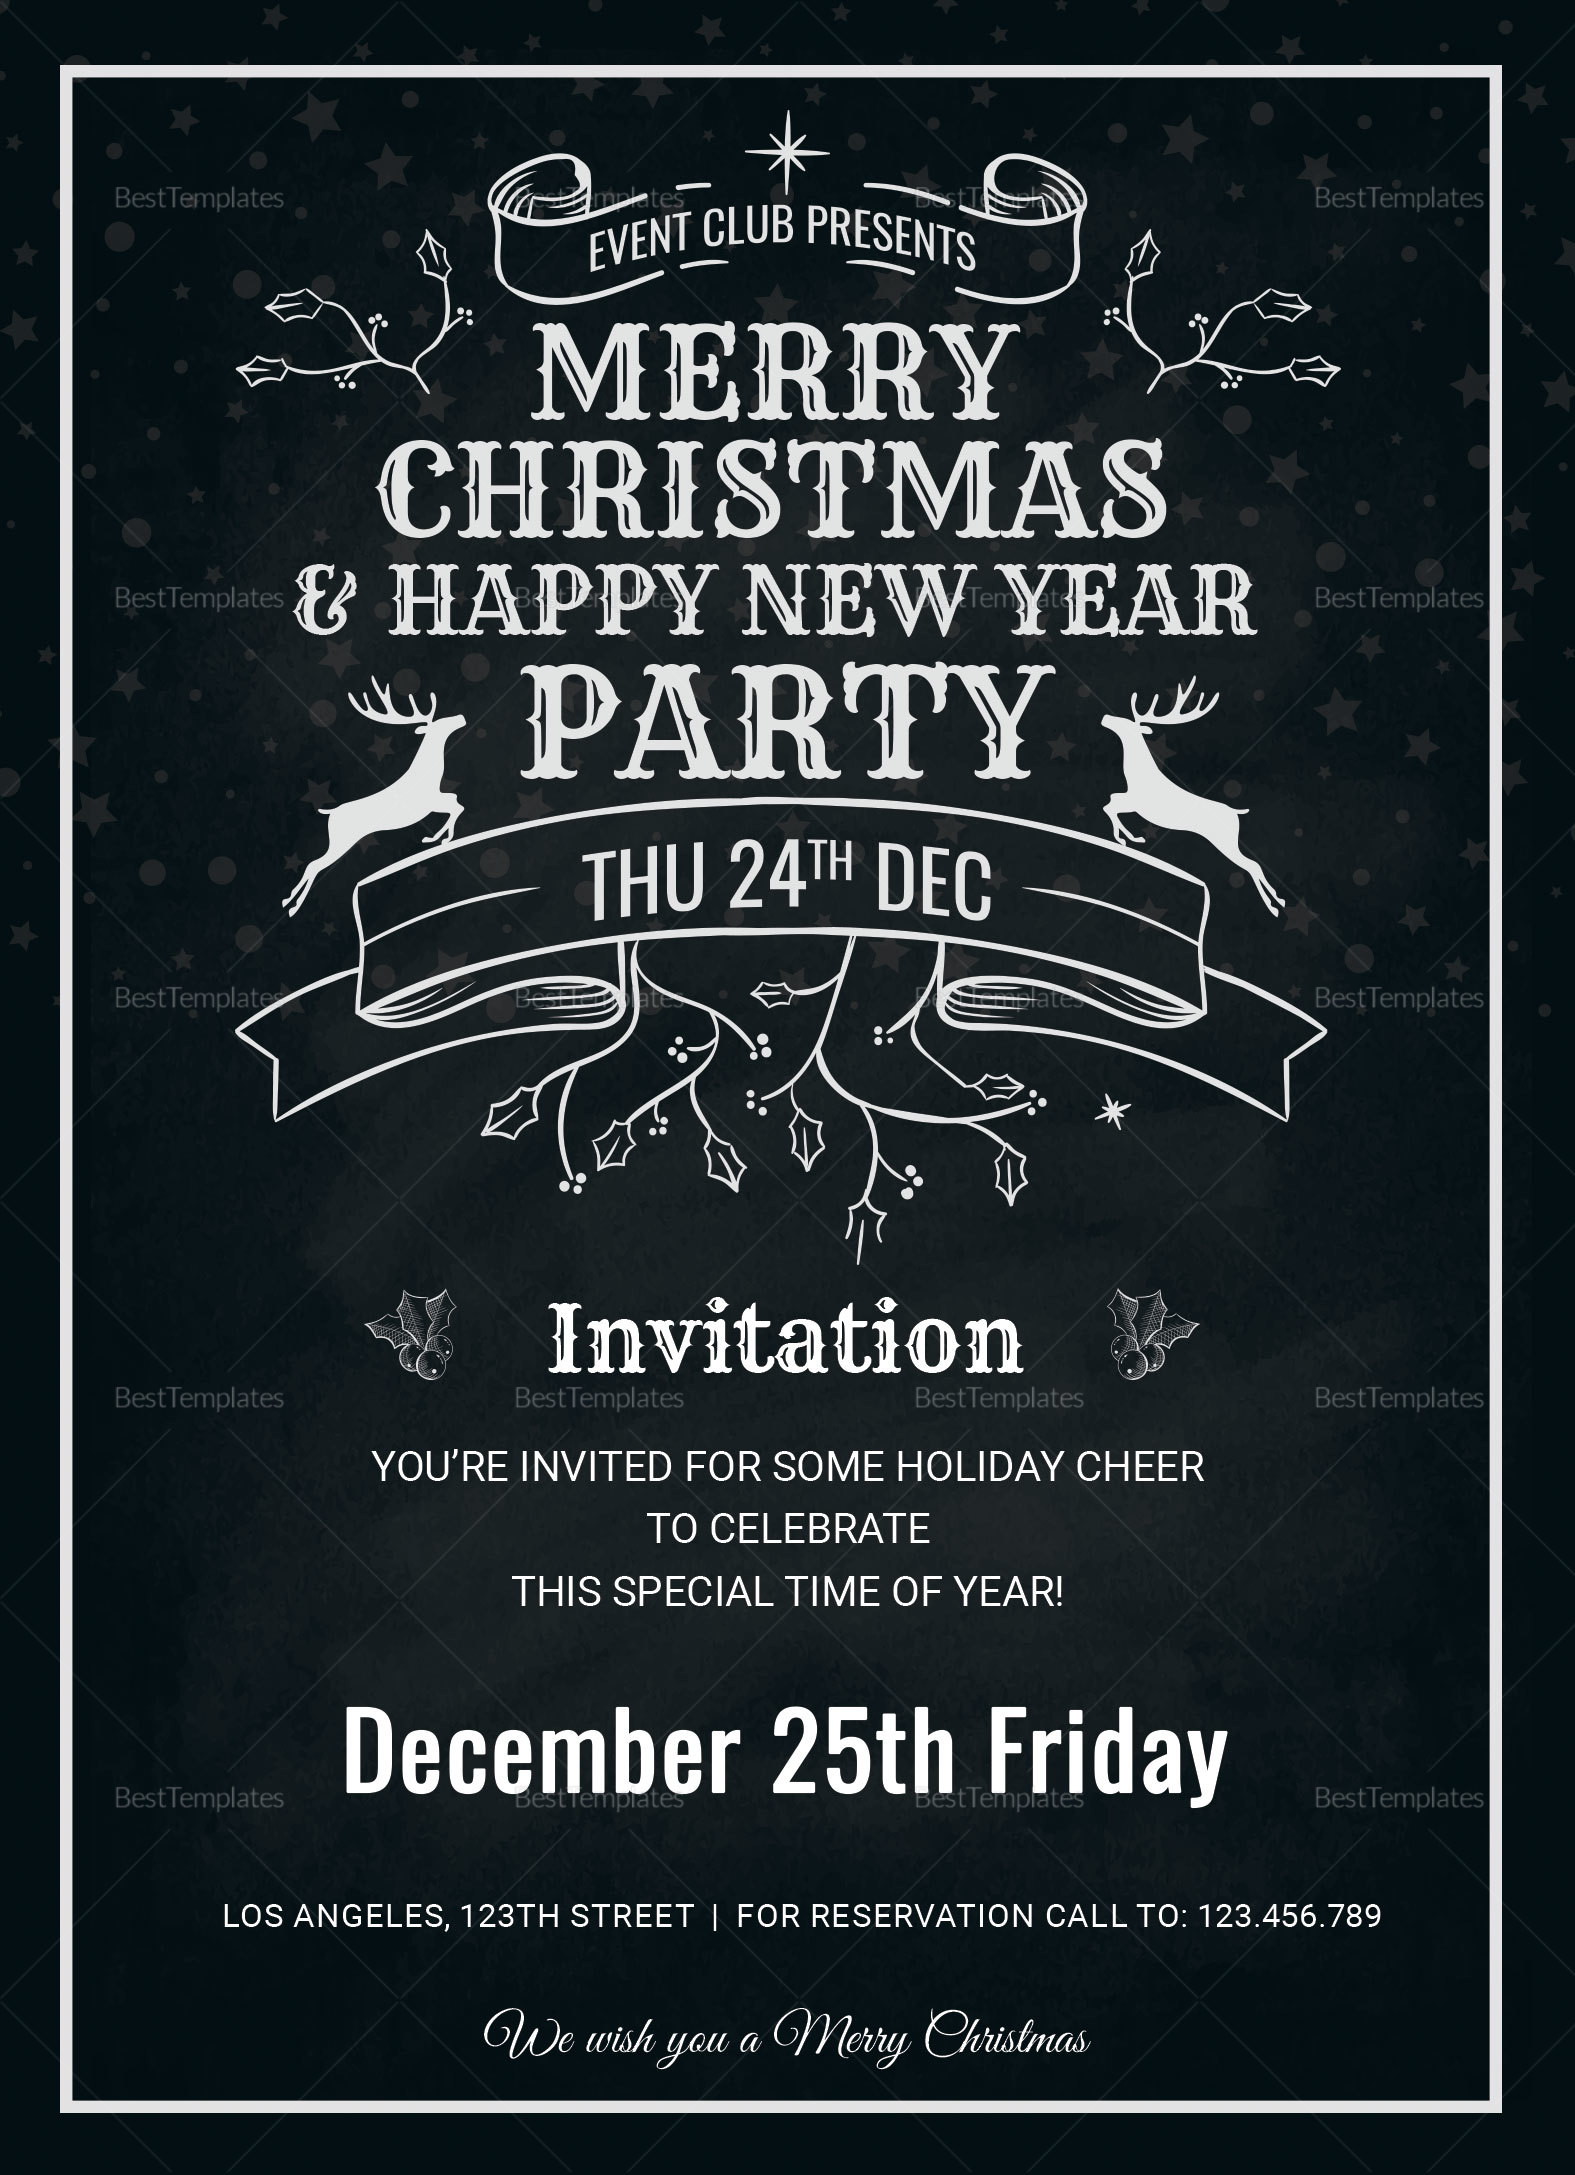 Elegant Christmas Holiday Invitation Card